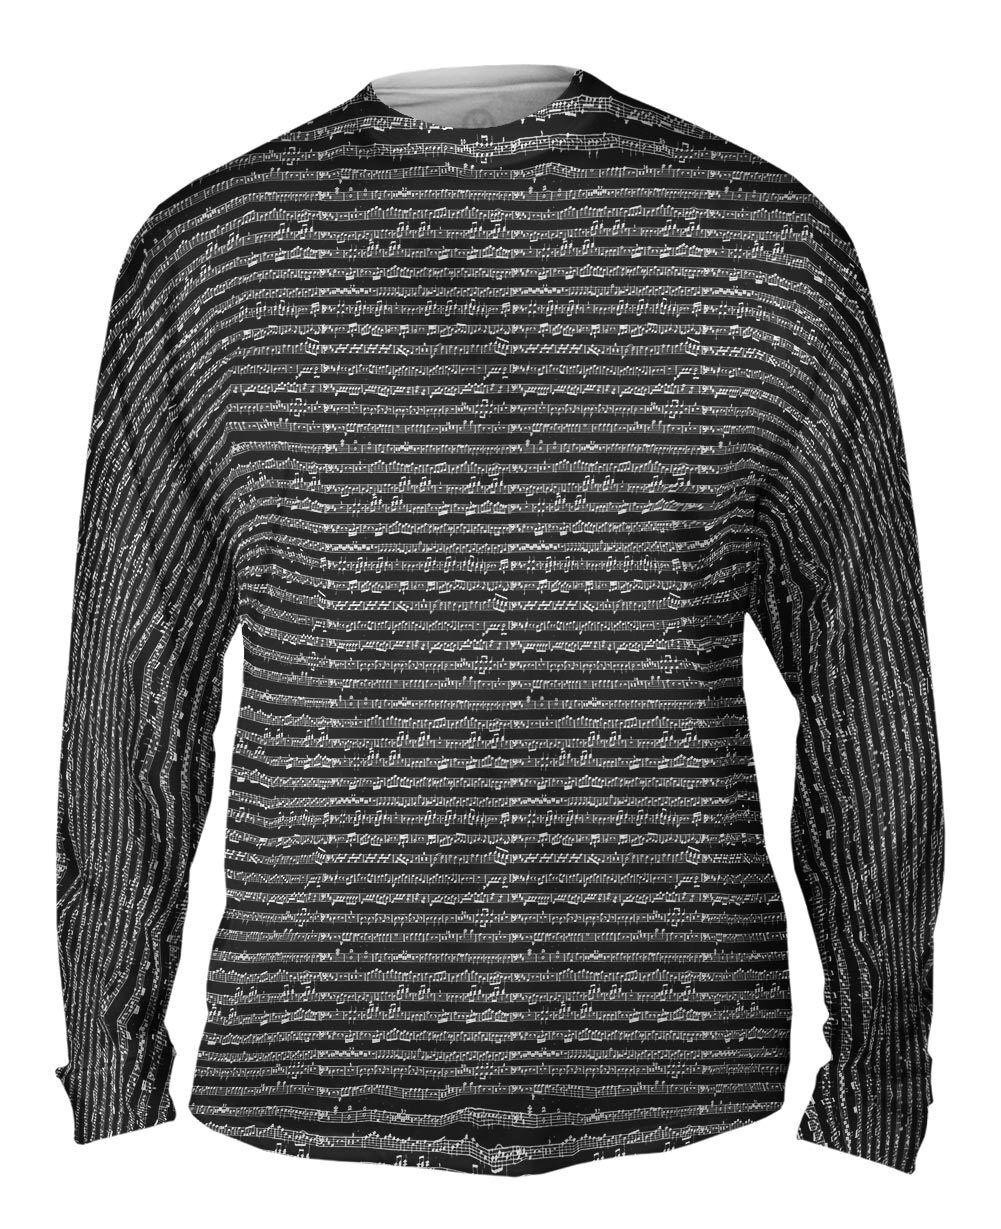 Yizzam - Sheet Music Notes -  Wolfgang Amade  -  New Mens Long Sleeve Shirt 2162